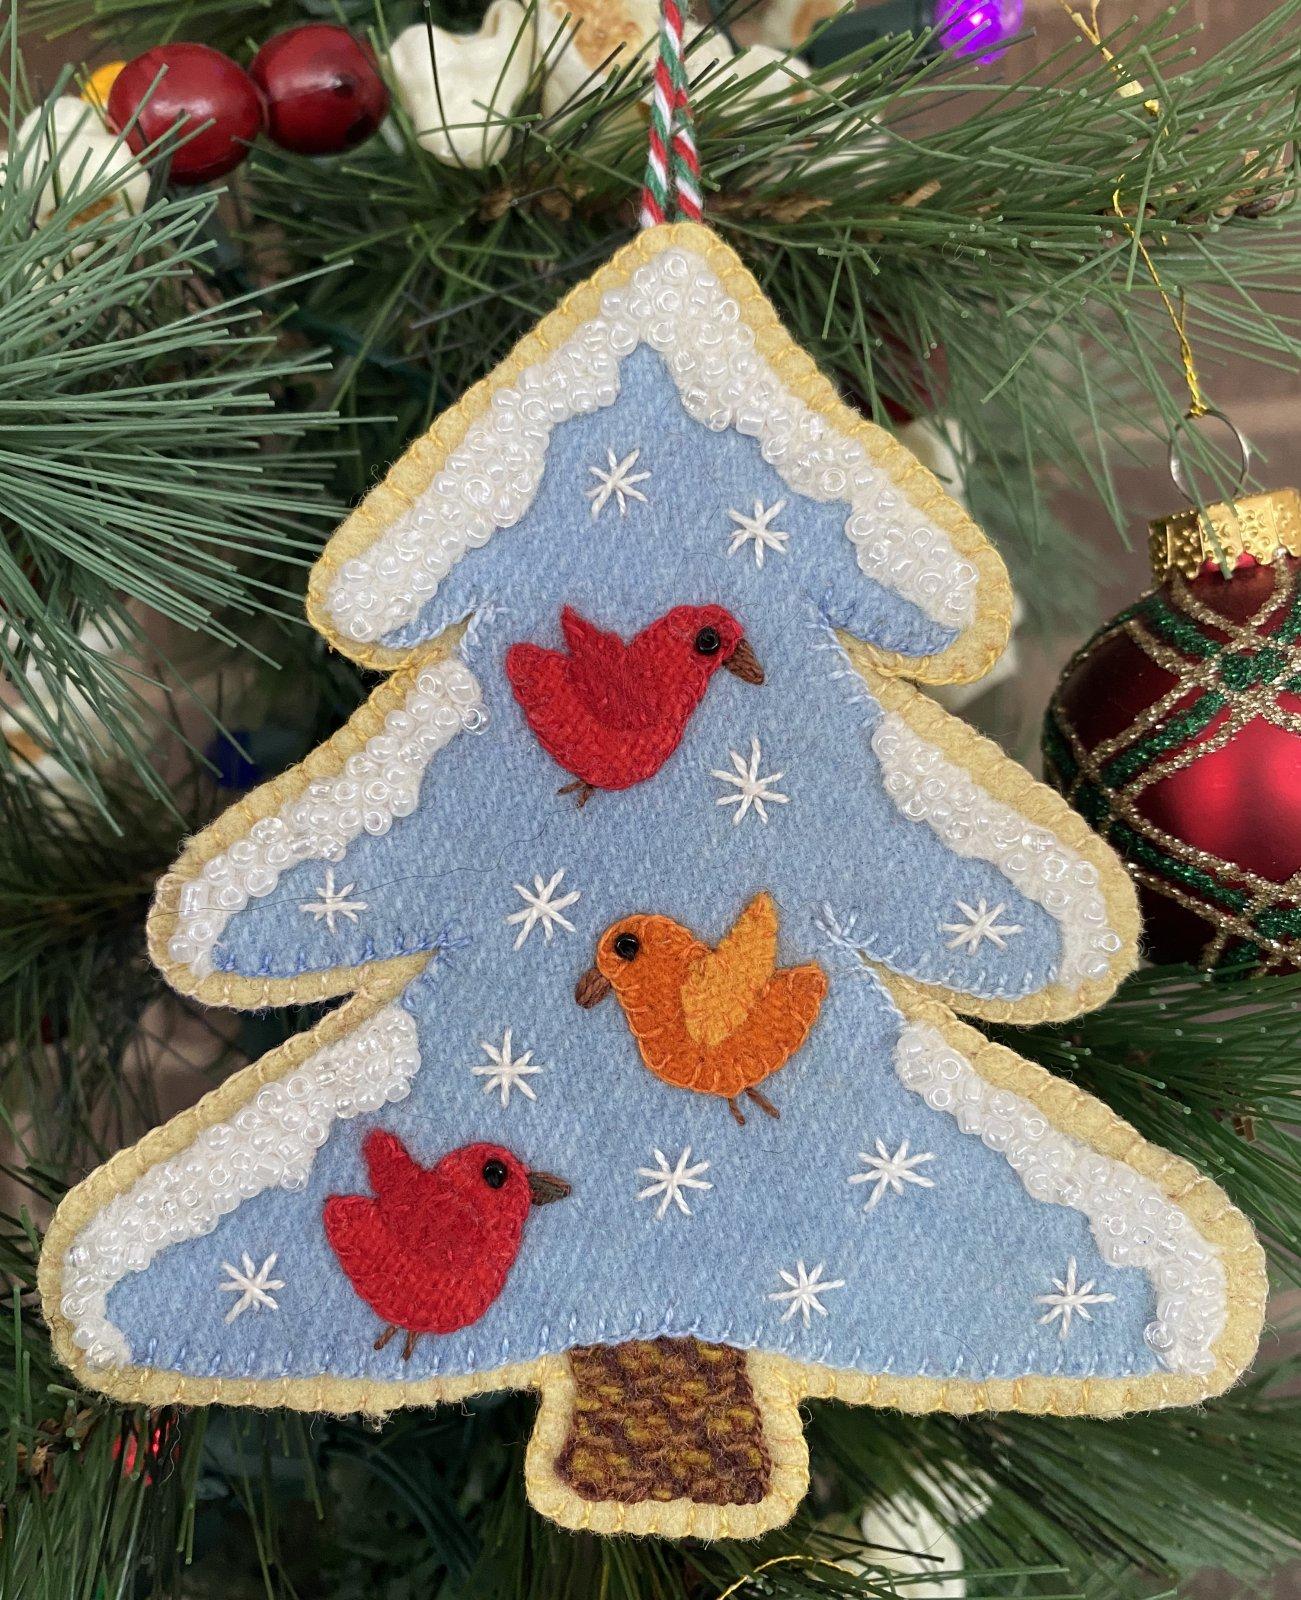 Sugar Plum Parrish Songbird Christmas Tree #11 Ornament Wool Kit Only